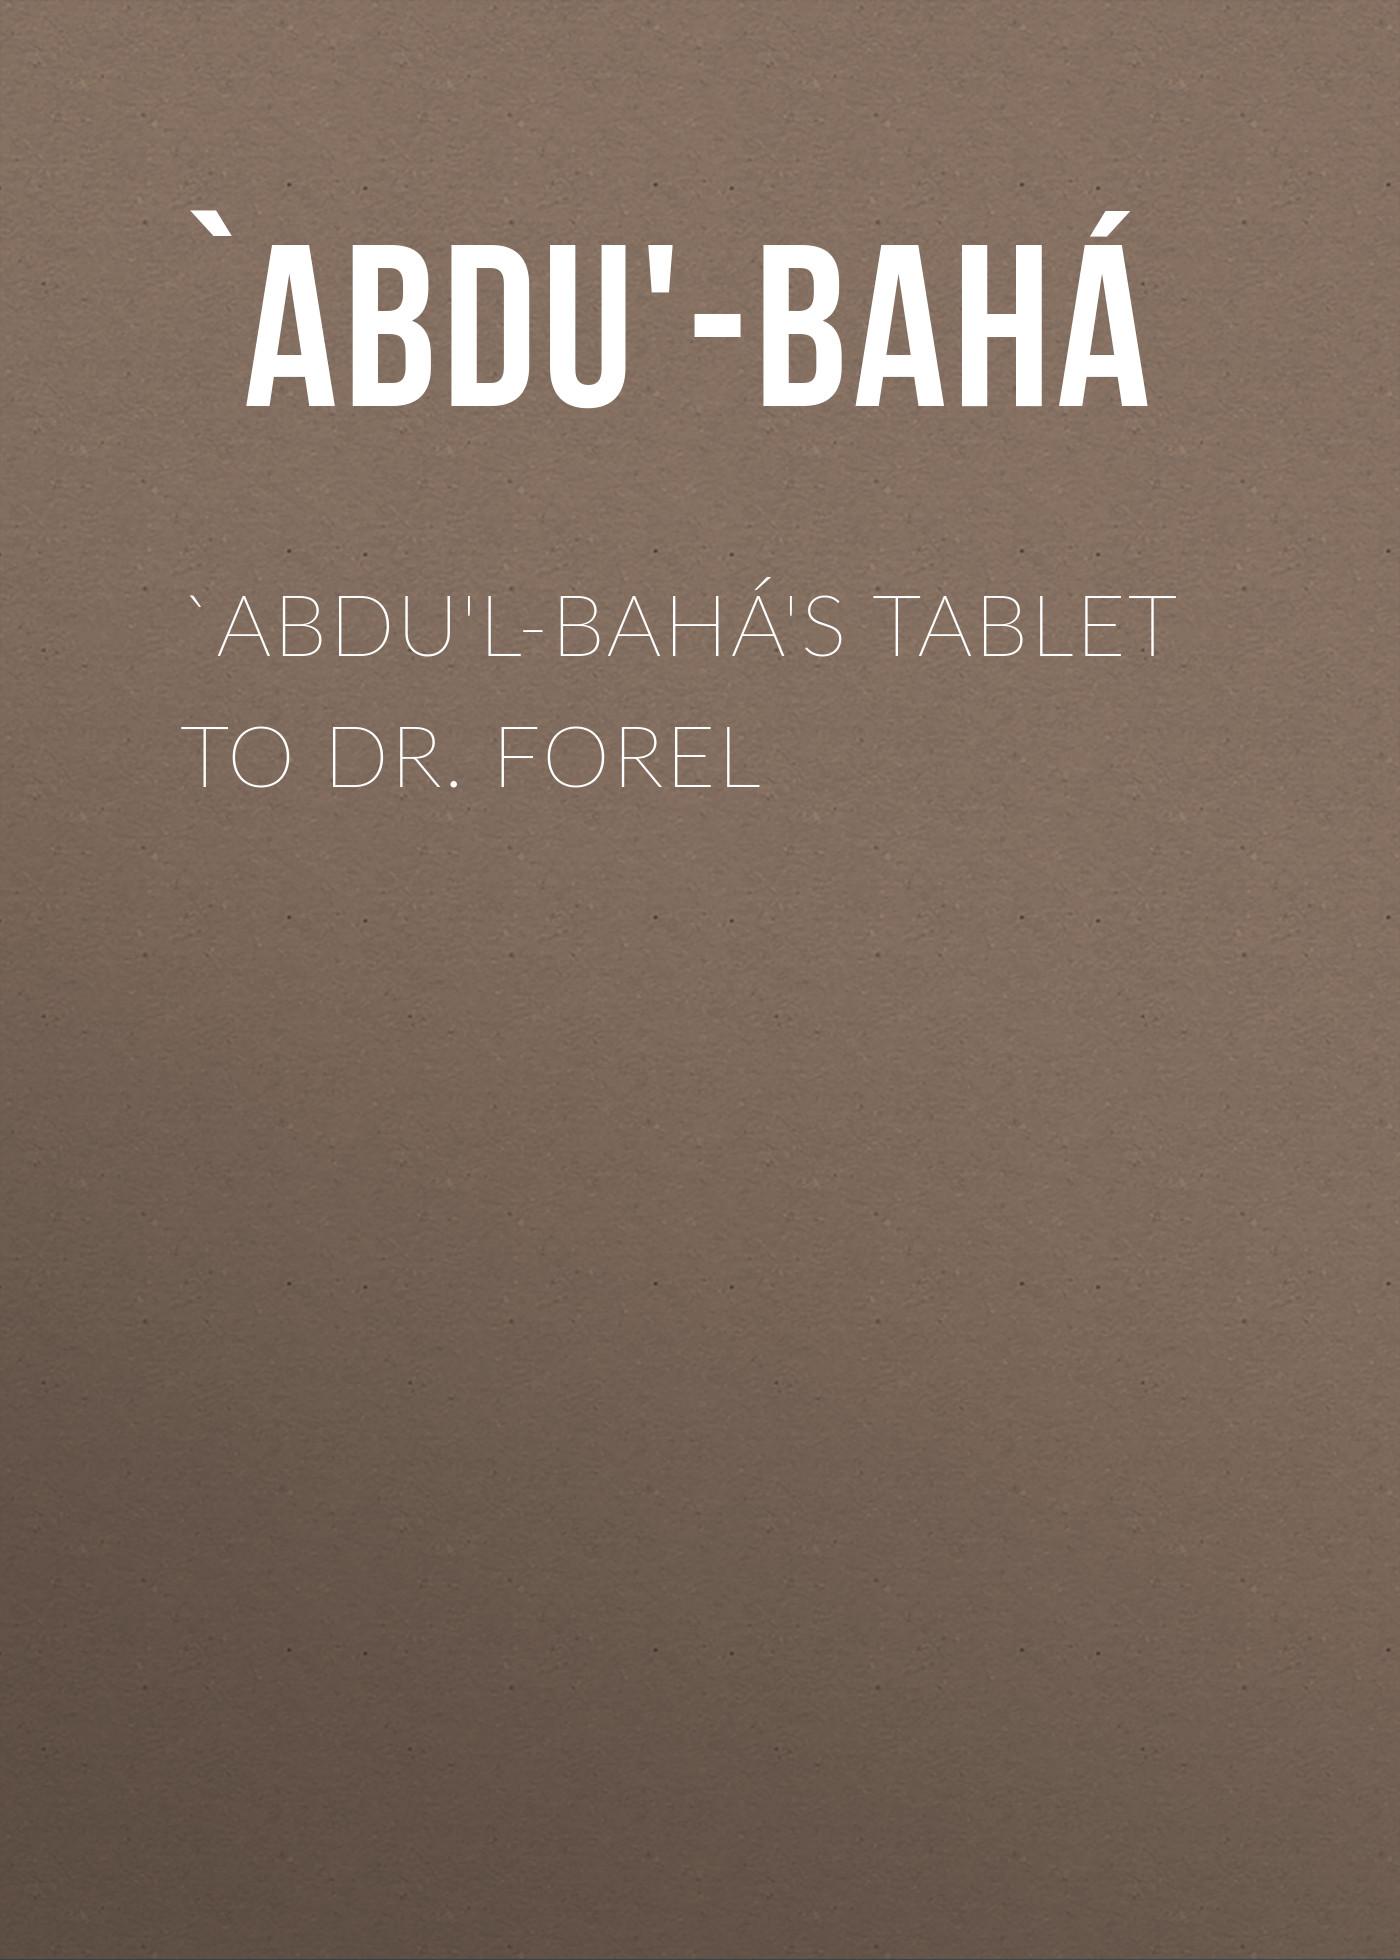 `Abdu'l-Bahá's Tablet to Dr. Forel – `Abdu'-Bahá